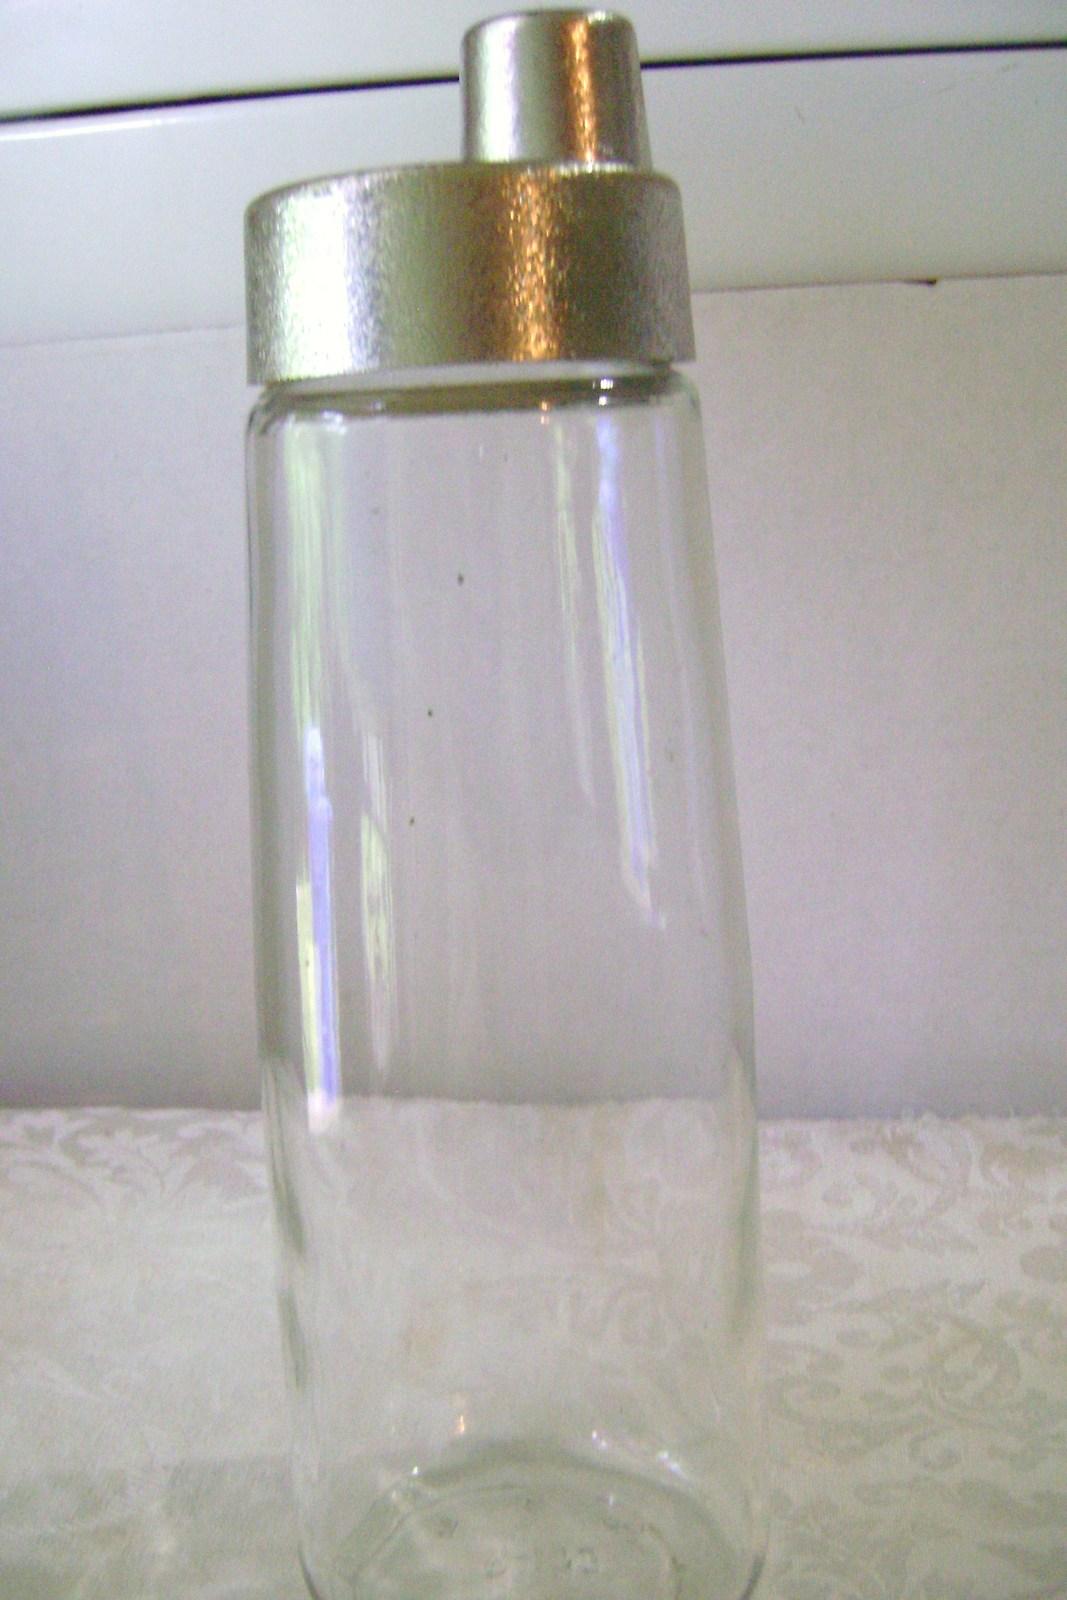 Anchor Hocking Cocktail /Martini Shaker - $10.00